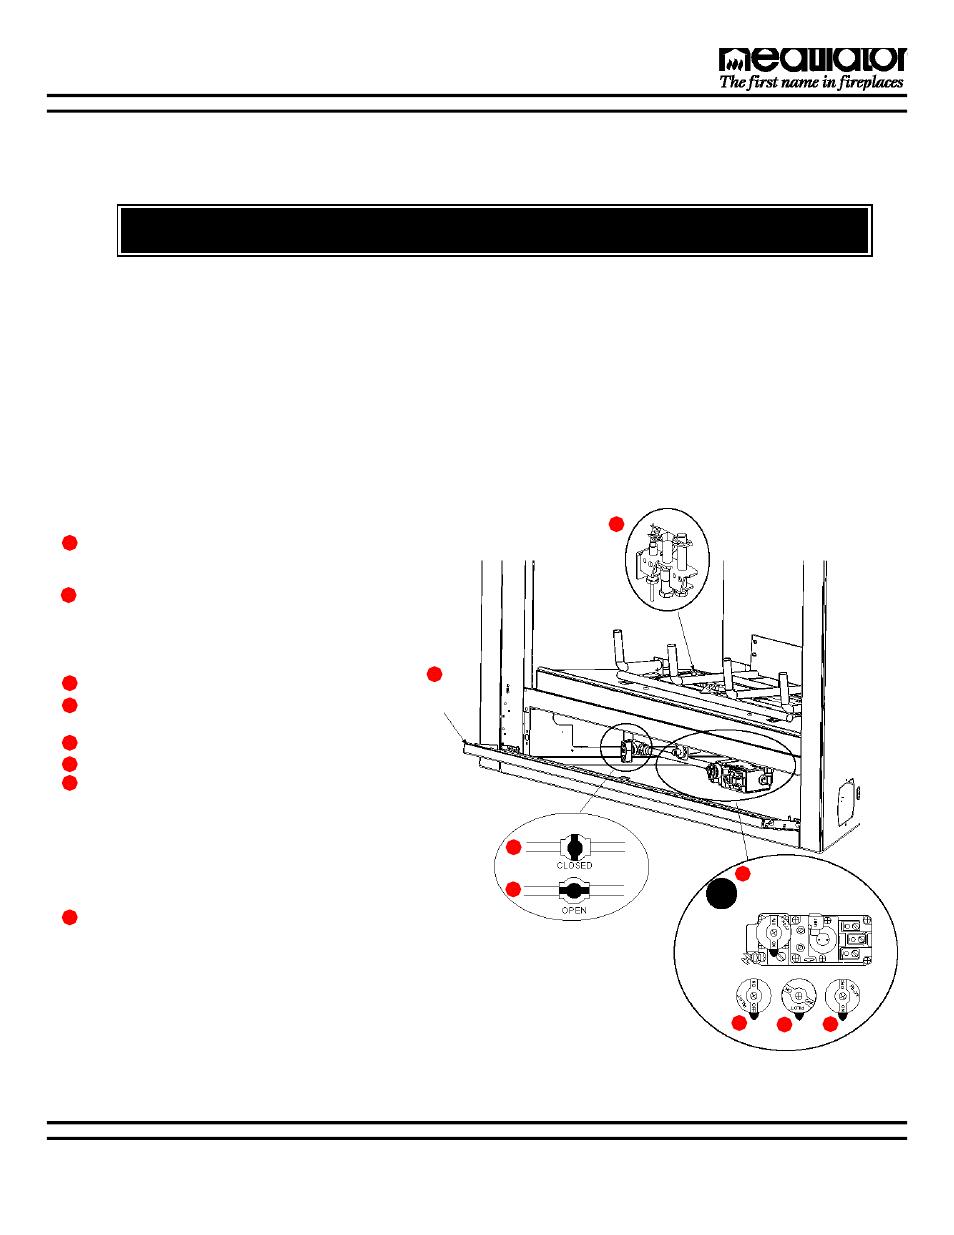 heatilator wiring diagram heatilator gas fireplace instruction manual | 2019 ebook library keh 2600 speaker wiring diagram